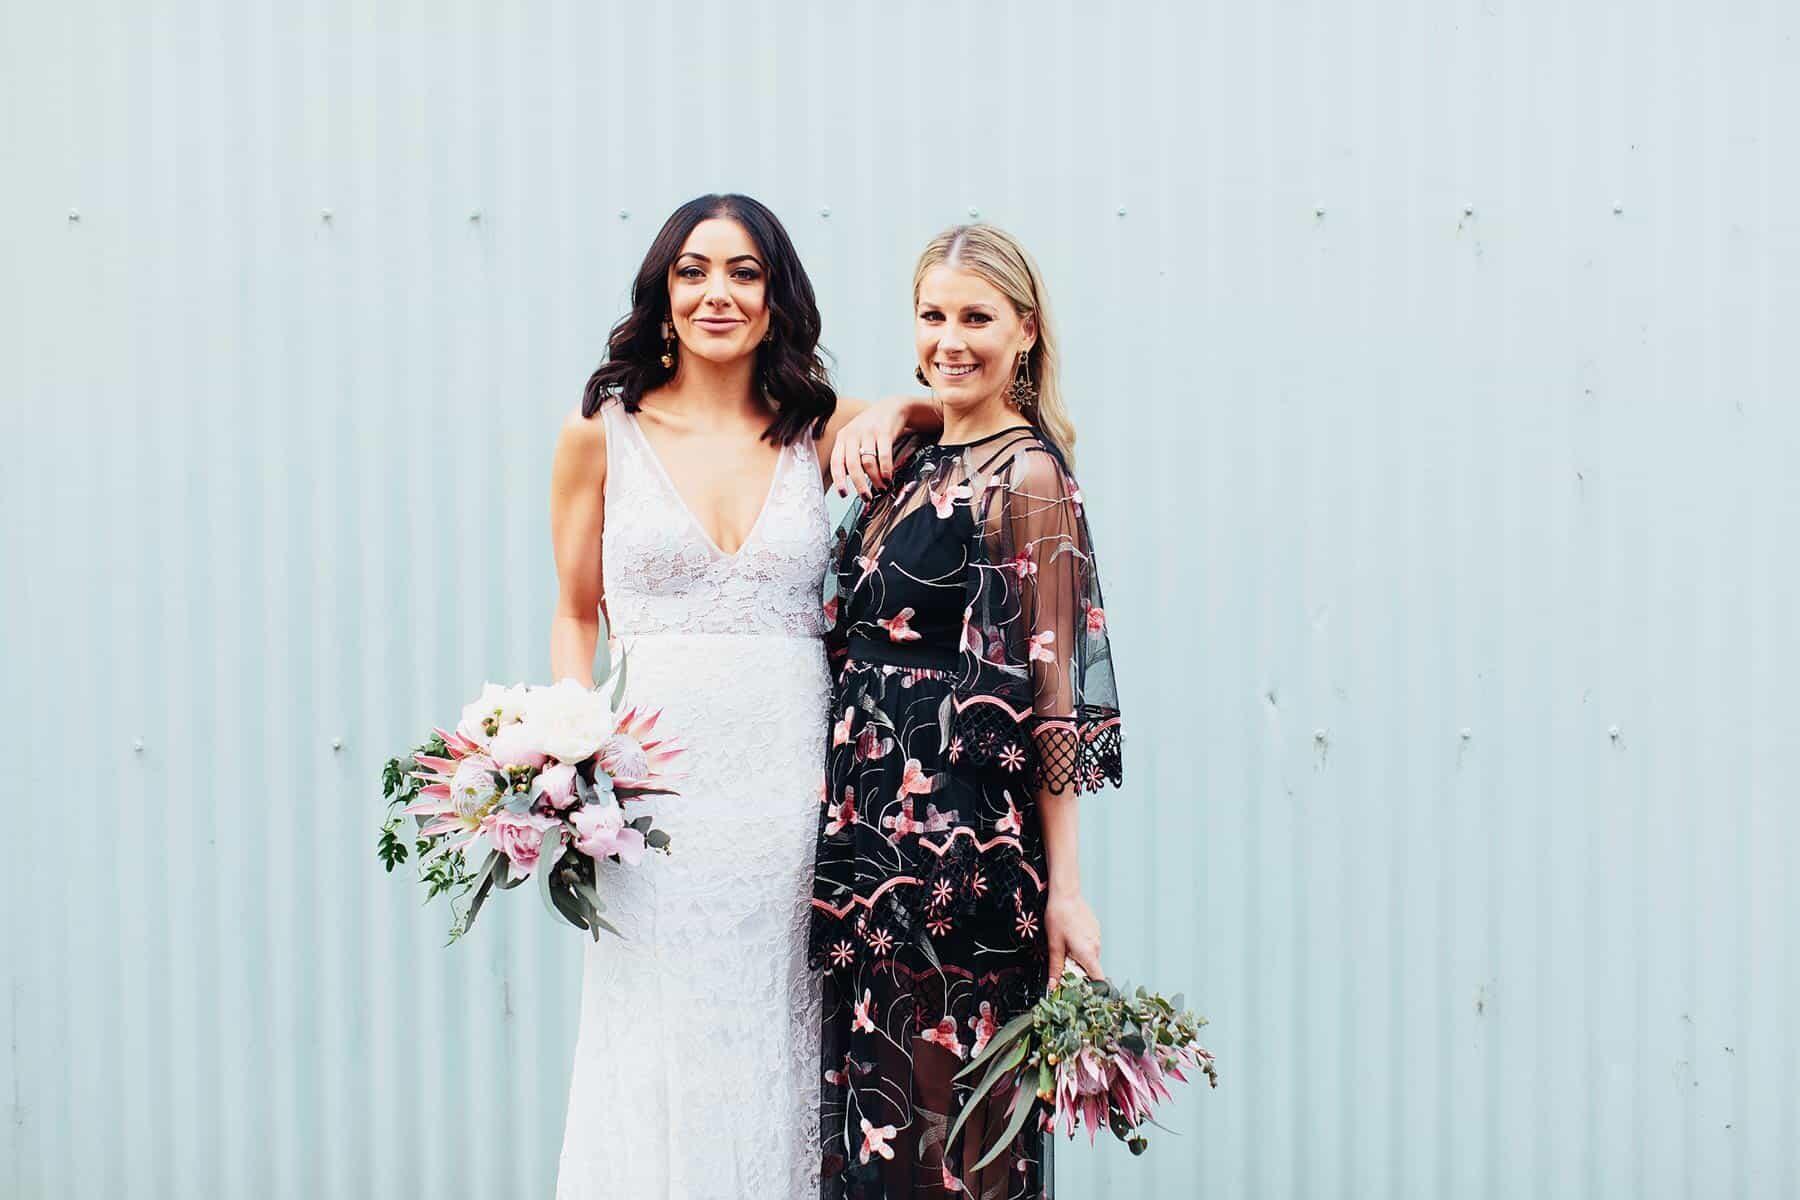 bridesmaid in black floral dress